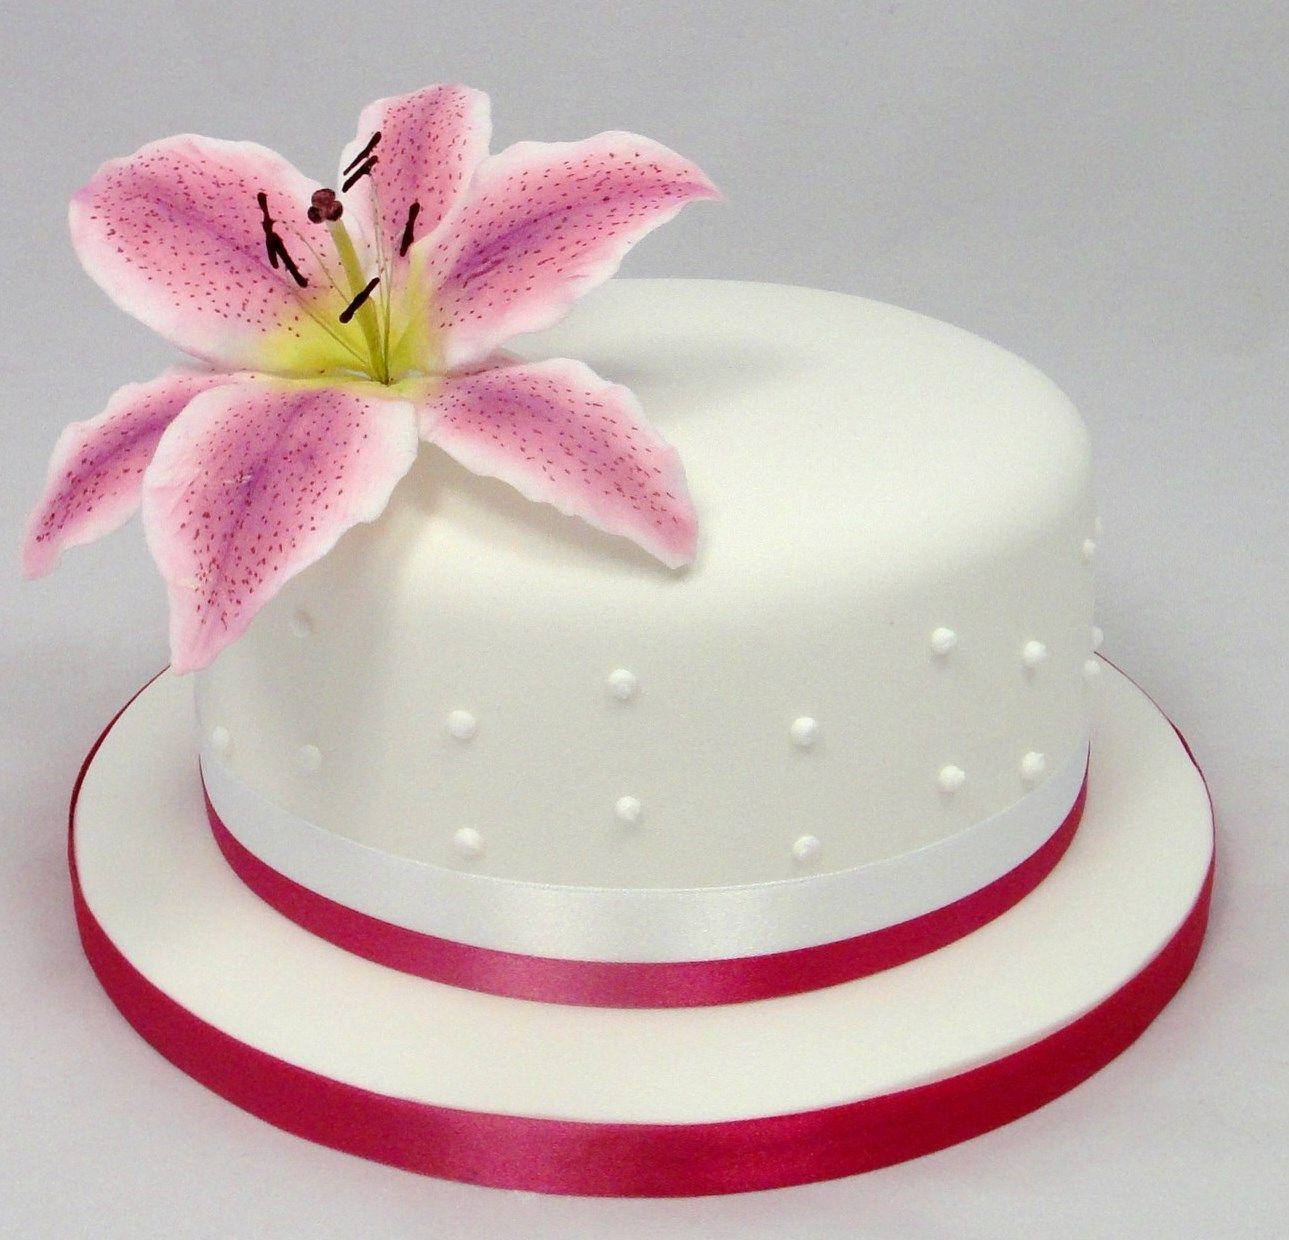 Stargazer Lily Birthday Cake 07917815712 wwwfancycakesbylindacouk